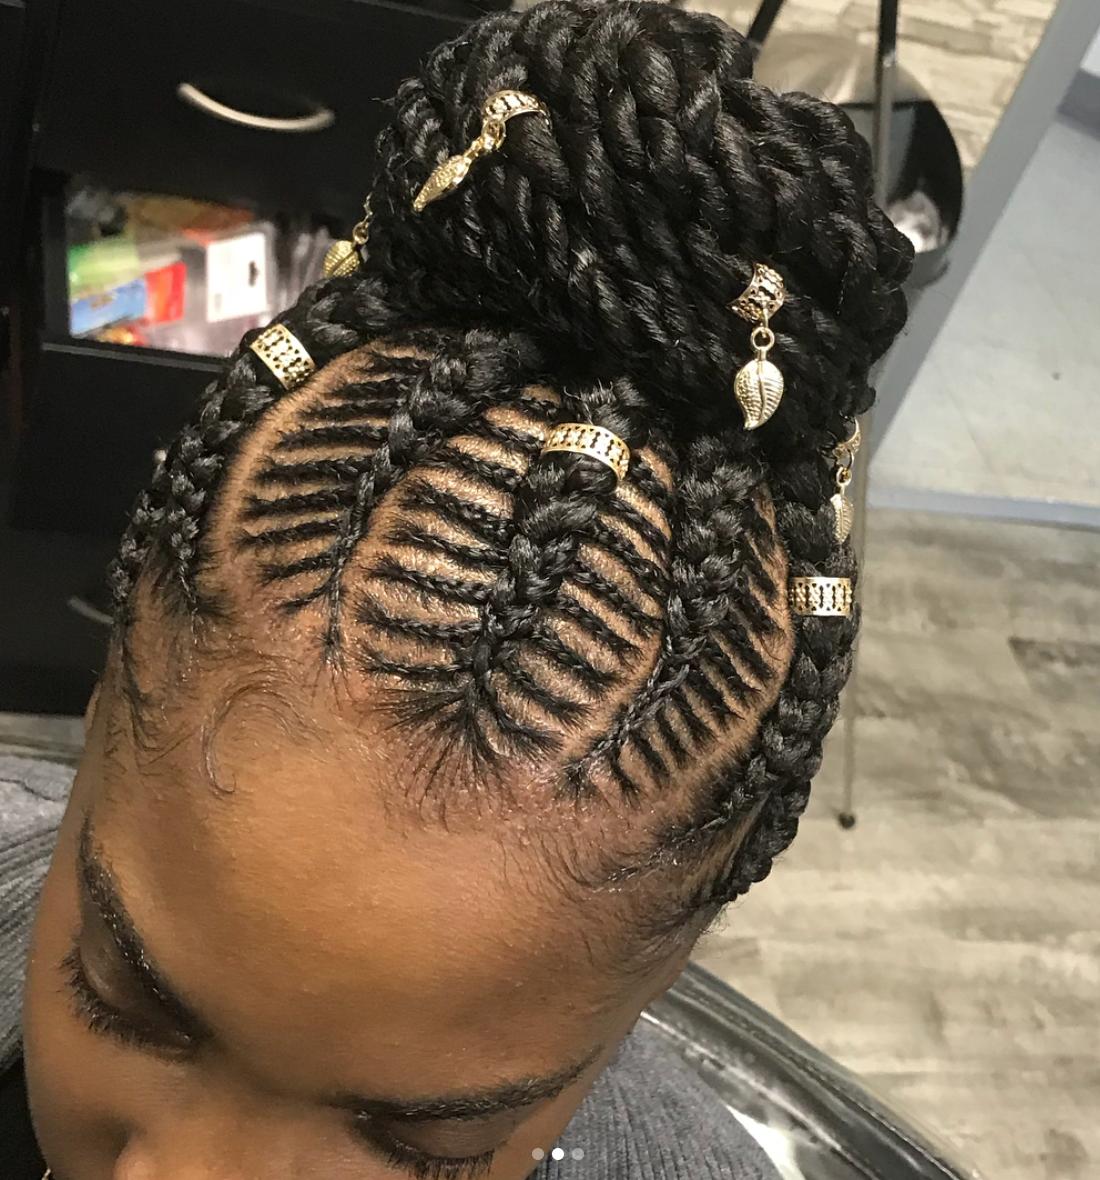 30 Beautiful Fishbone Braid Hairstyles For Black Women Hair Styles Kids Braided Hairstyles Braided Hairstyles For Black Women